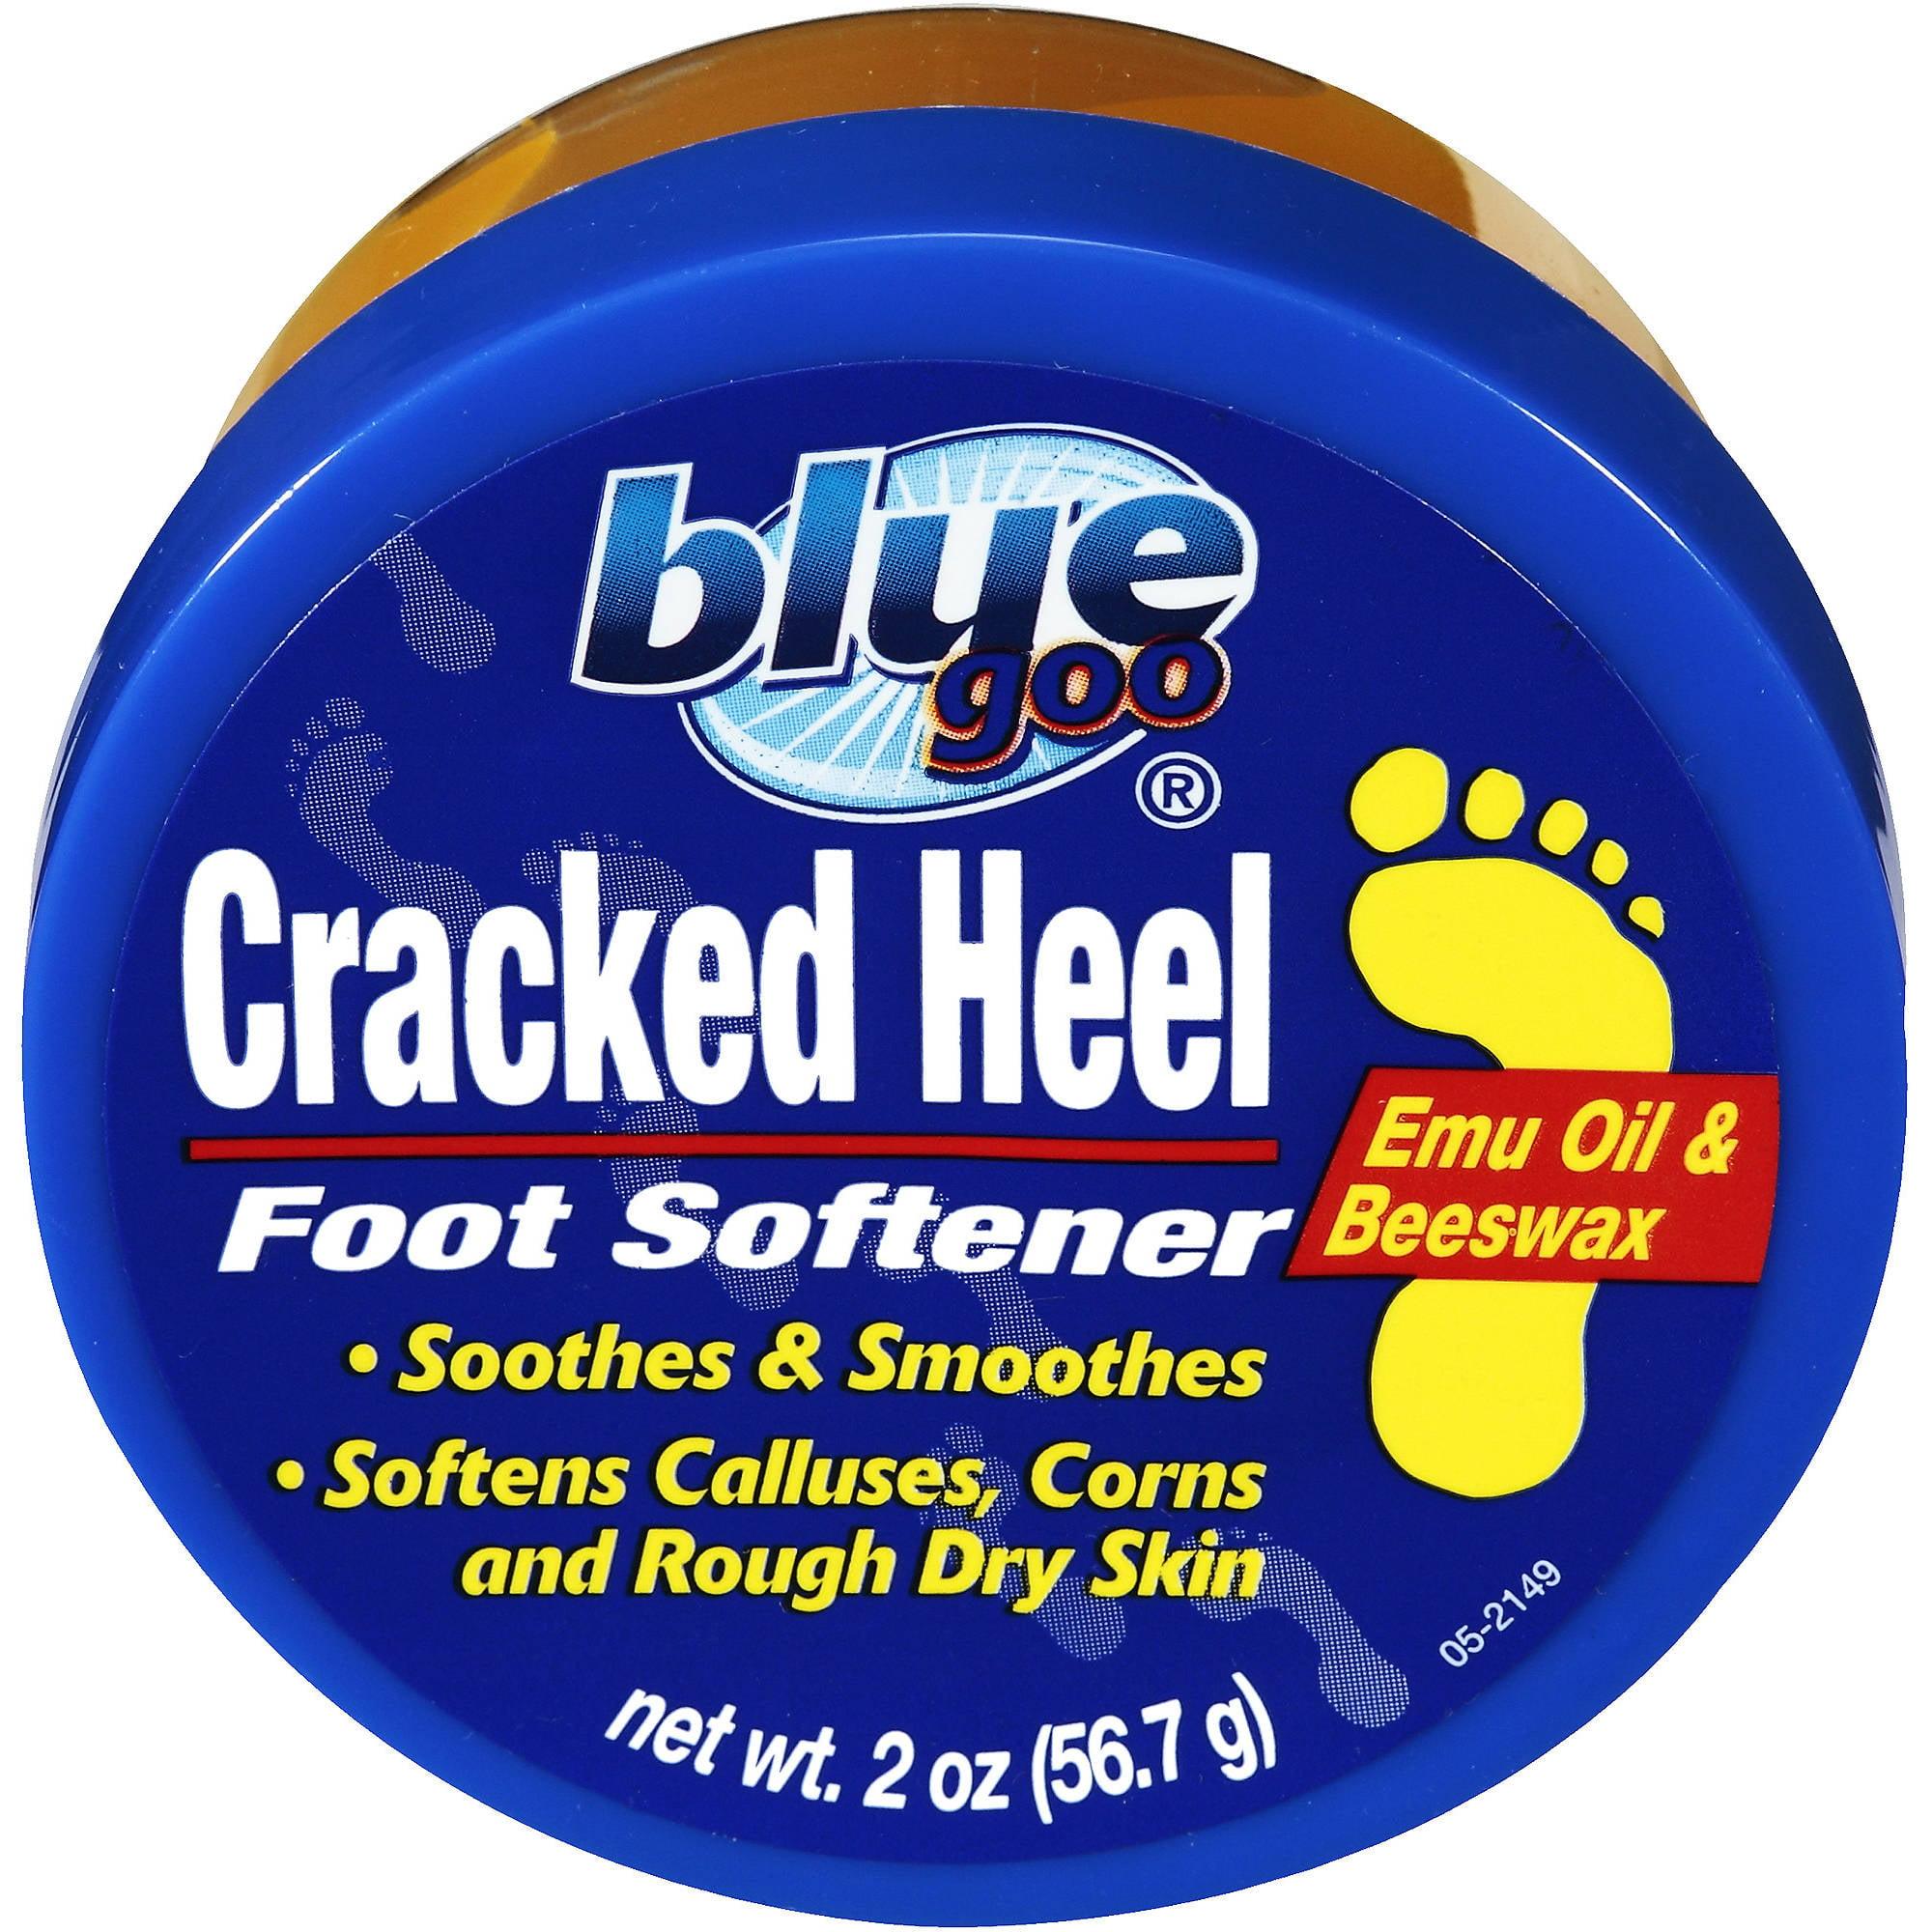 Blue Goo Cracked Heel Foot Softener, 2 oz 70166